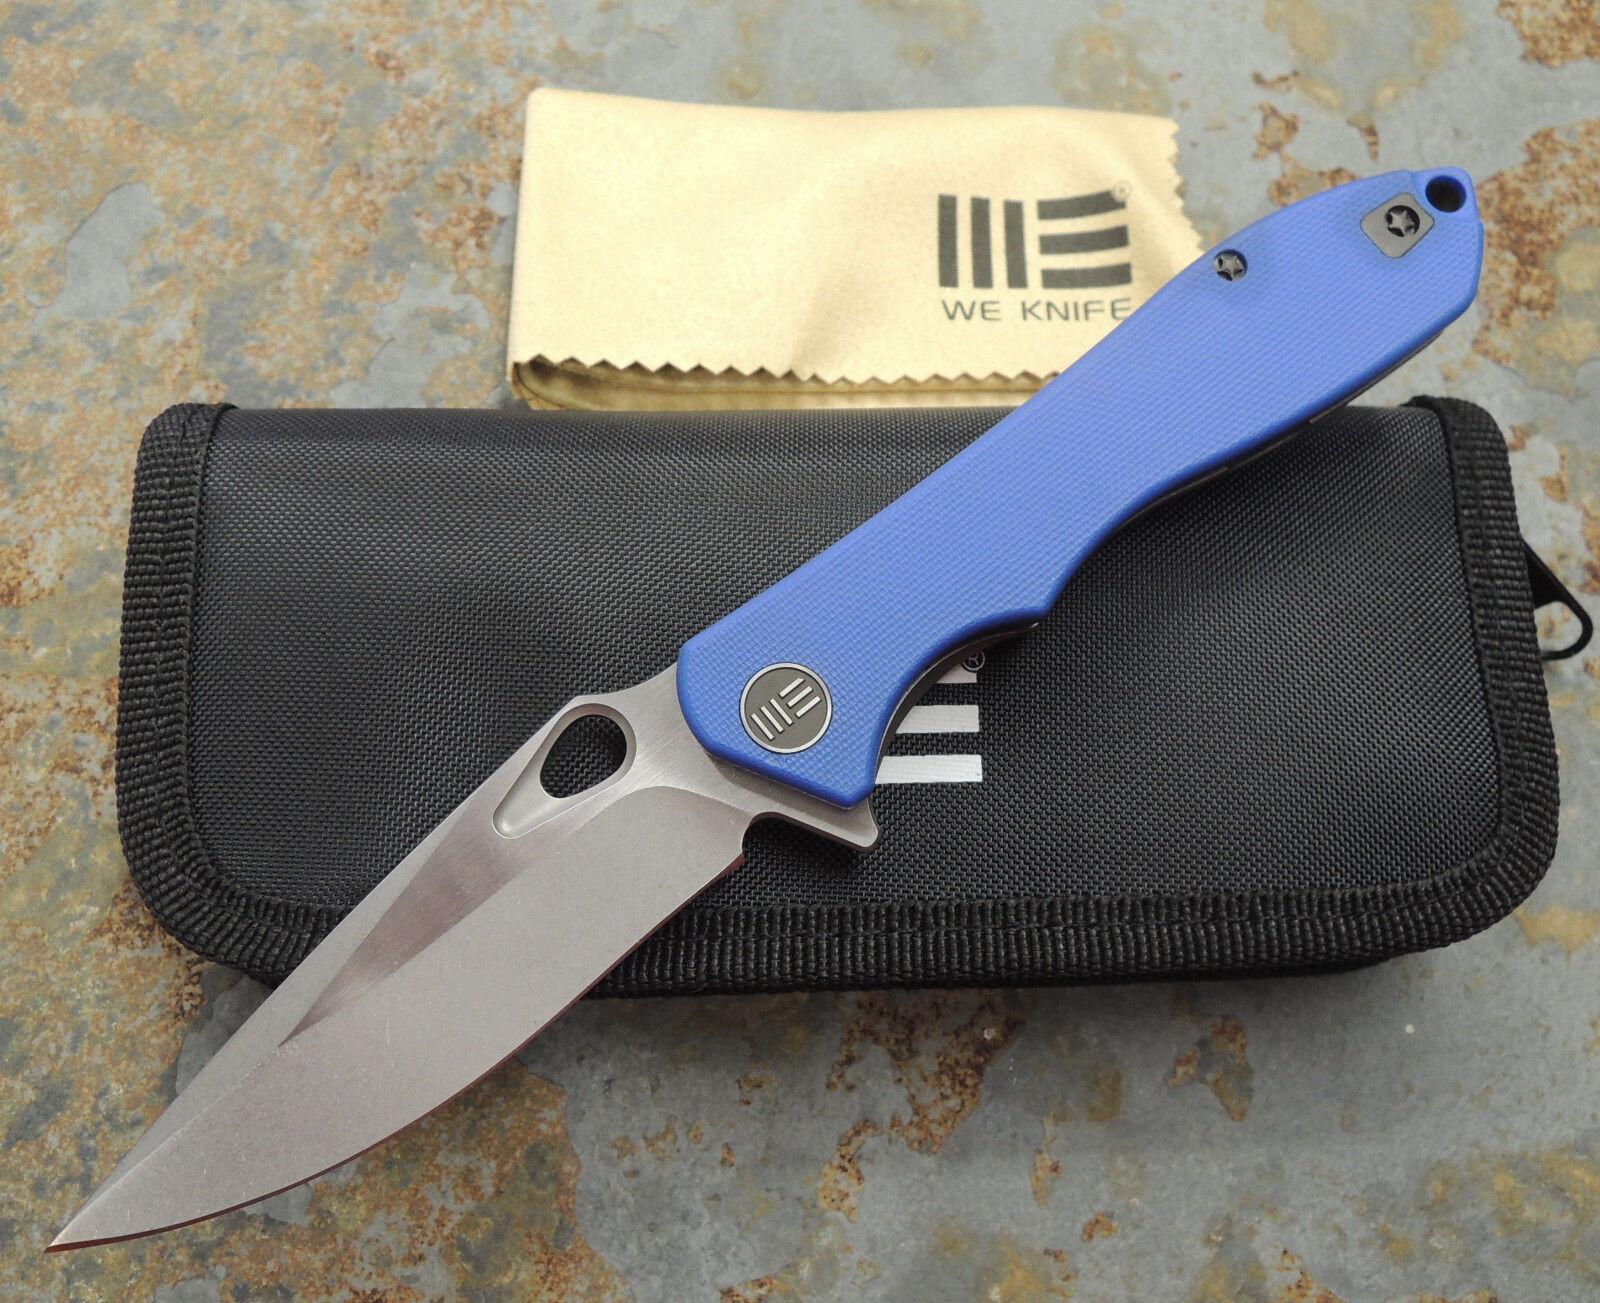 We Knife IGNITION 715D Messer Taschenmesser VG10 Stahl G10 Griff / Titan